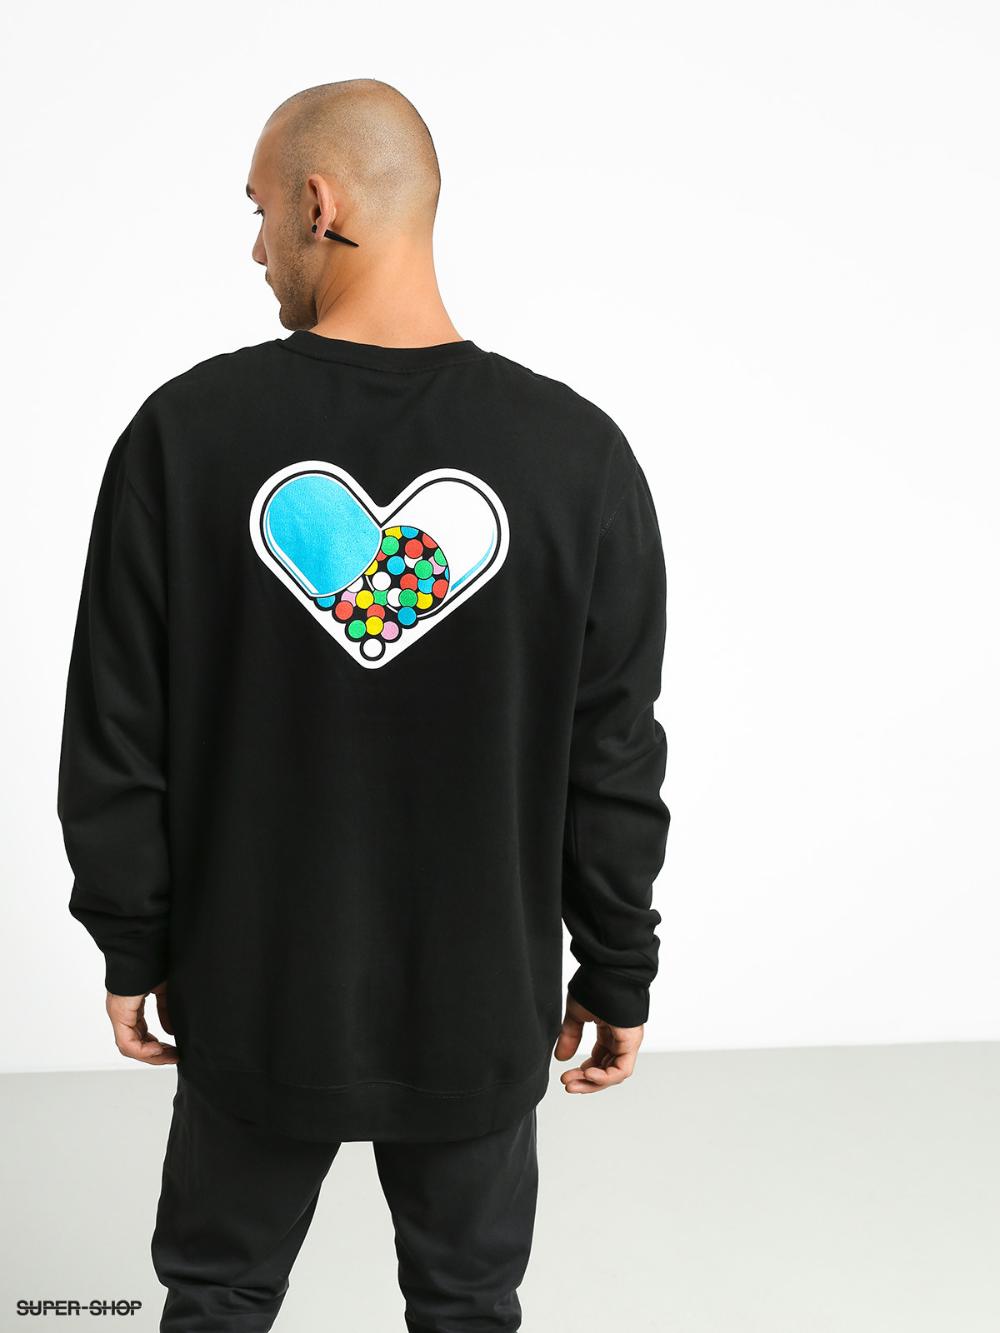 Enjoi Artsy Sweatshirt Black Sweatshirts Sweatshirts Hoodie Black Sweatshirts [ 1333 x 1000 Pixel ]